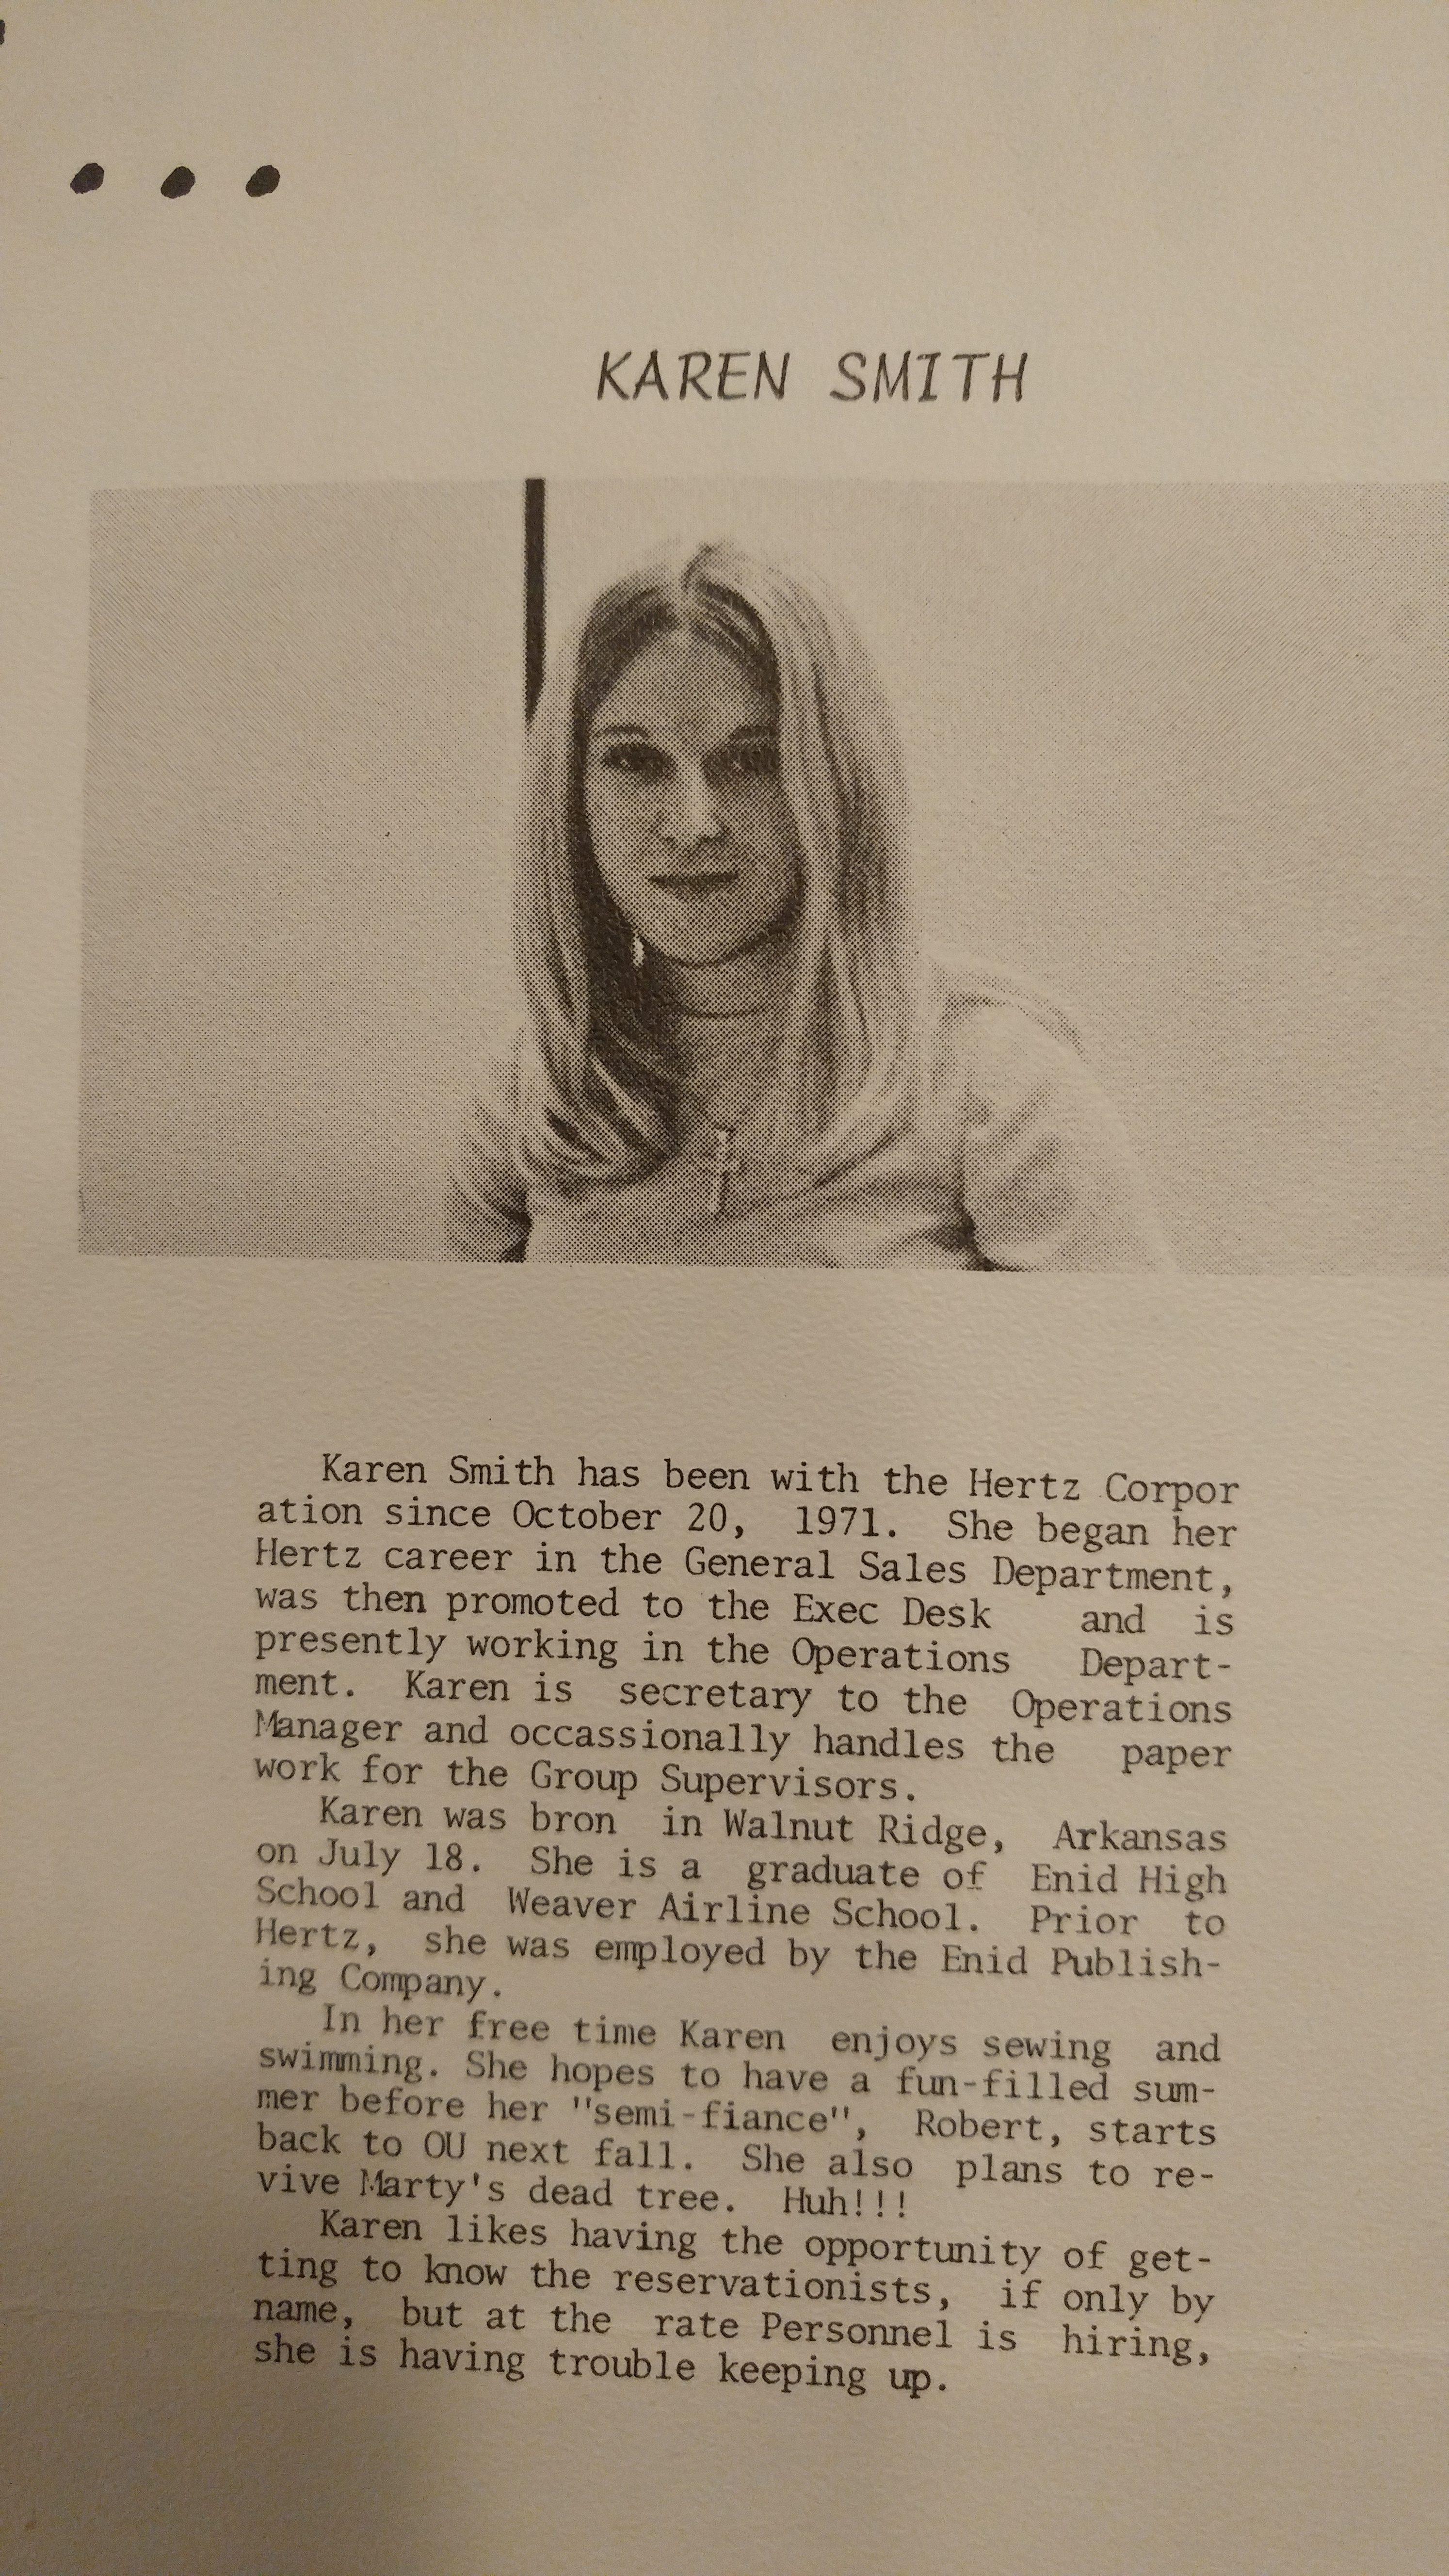 Karen Smith when I worked at Hertz Rent a Car